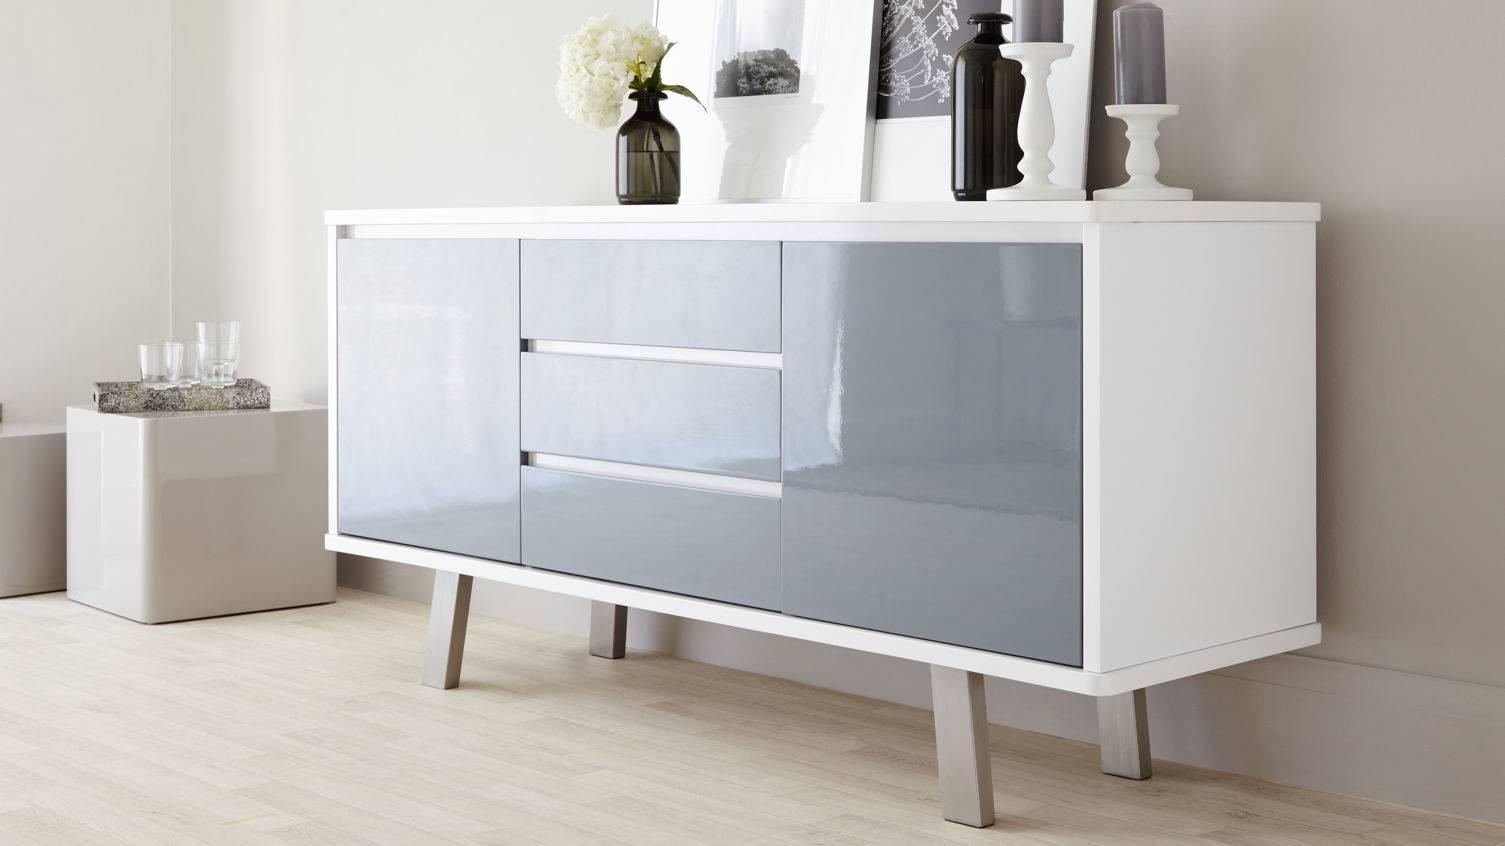 Furniture: Modern White And Grey Gloss Modern Sideboard With With Regard To Grey Gloss Sideboard (#8 of 20)